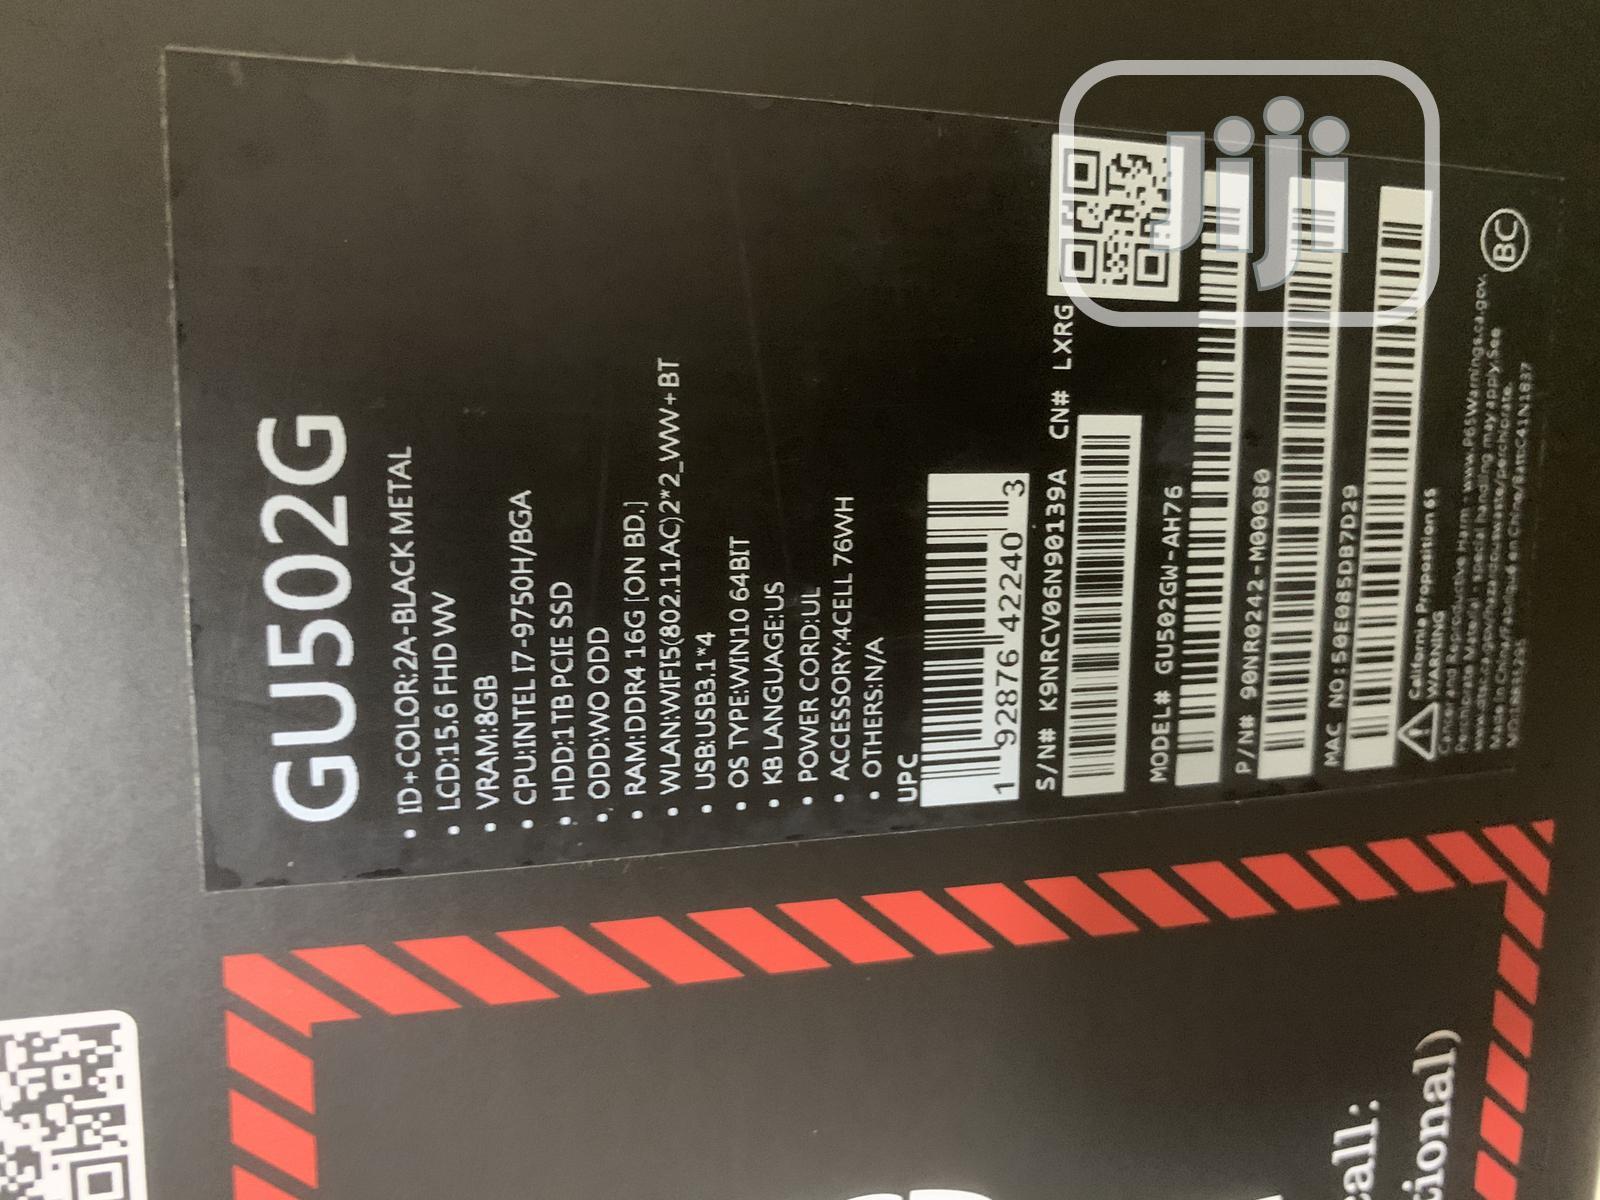 New Laptop Asus ROG Zephyrus M15 GU502LU 16GB Intel Core i7 SSD 1T | Laptops & Computers for sale in Ikeja, Lagos State, Nigeria